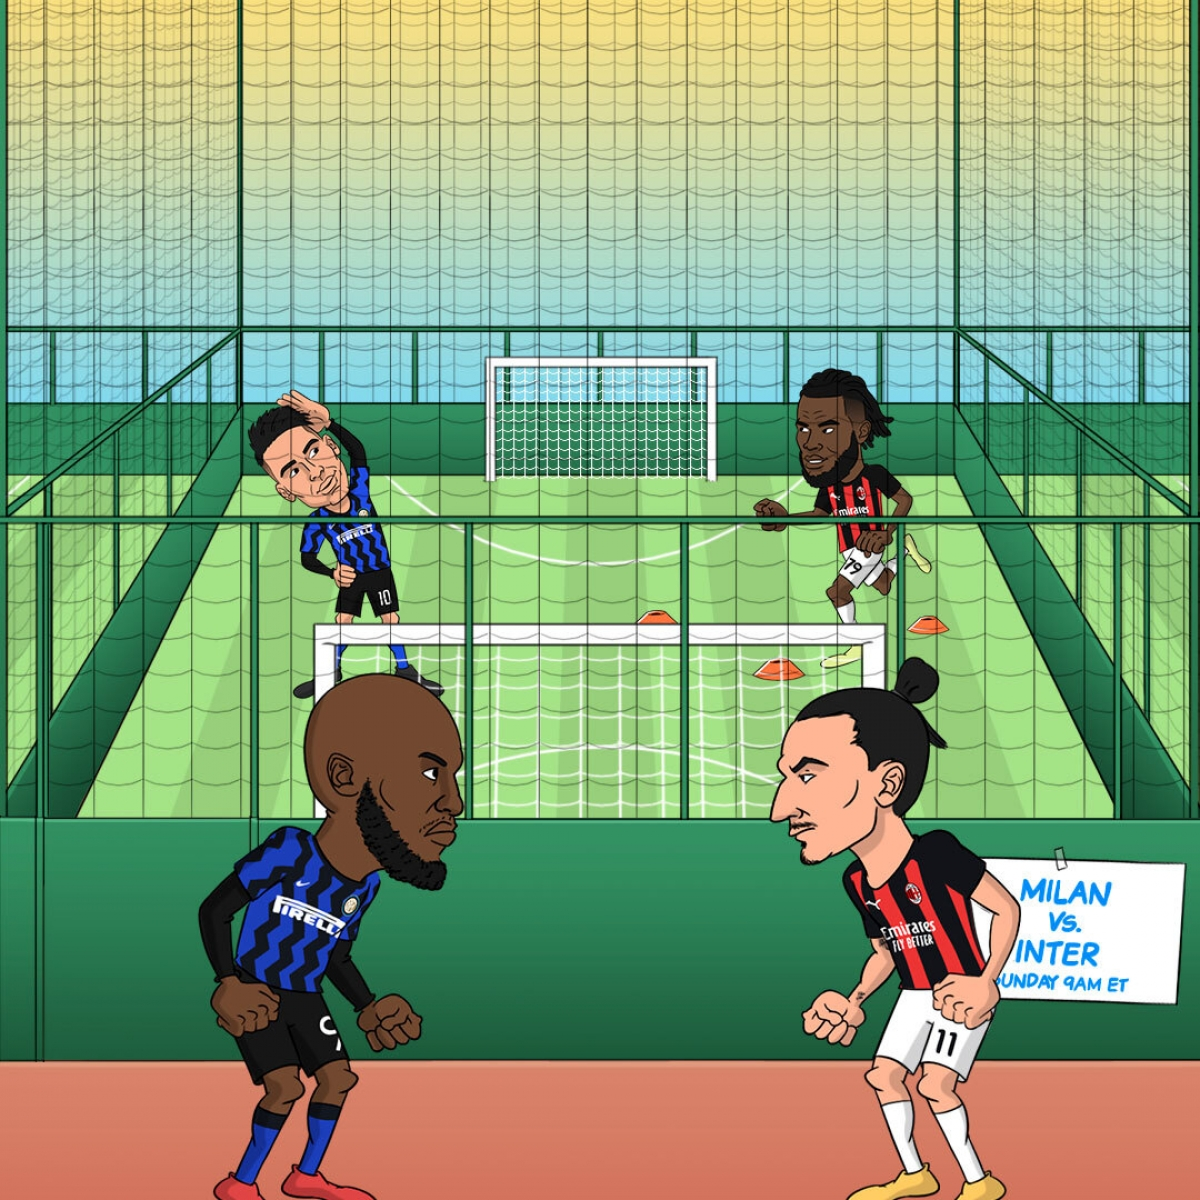 Romelu Lukaku và Zlatan Ibrahimovic tái ngộ trong trận derby Milan. (Ảnh: Bleacher Reports)